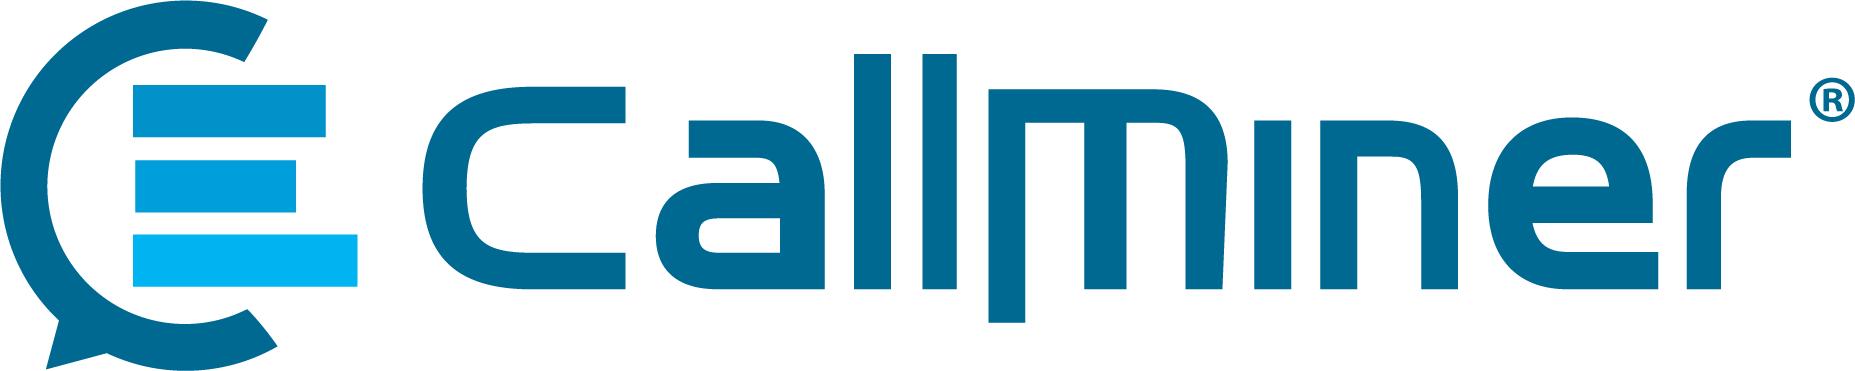 CallMiner, Inc